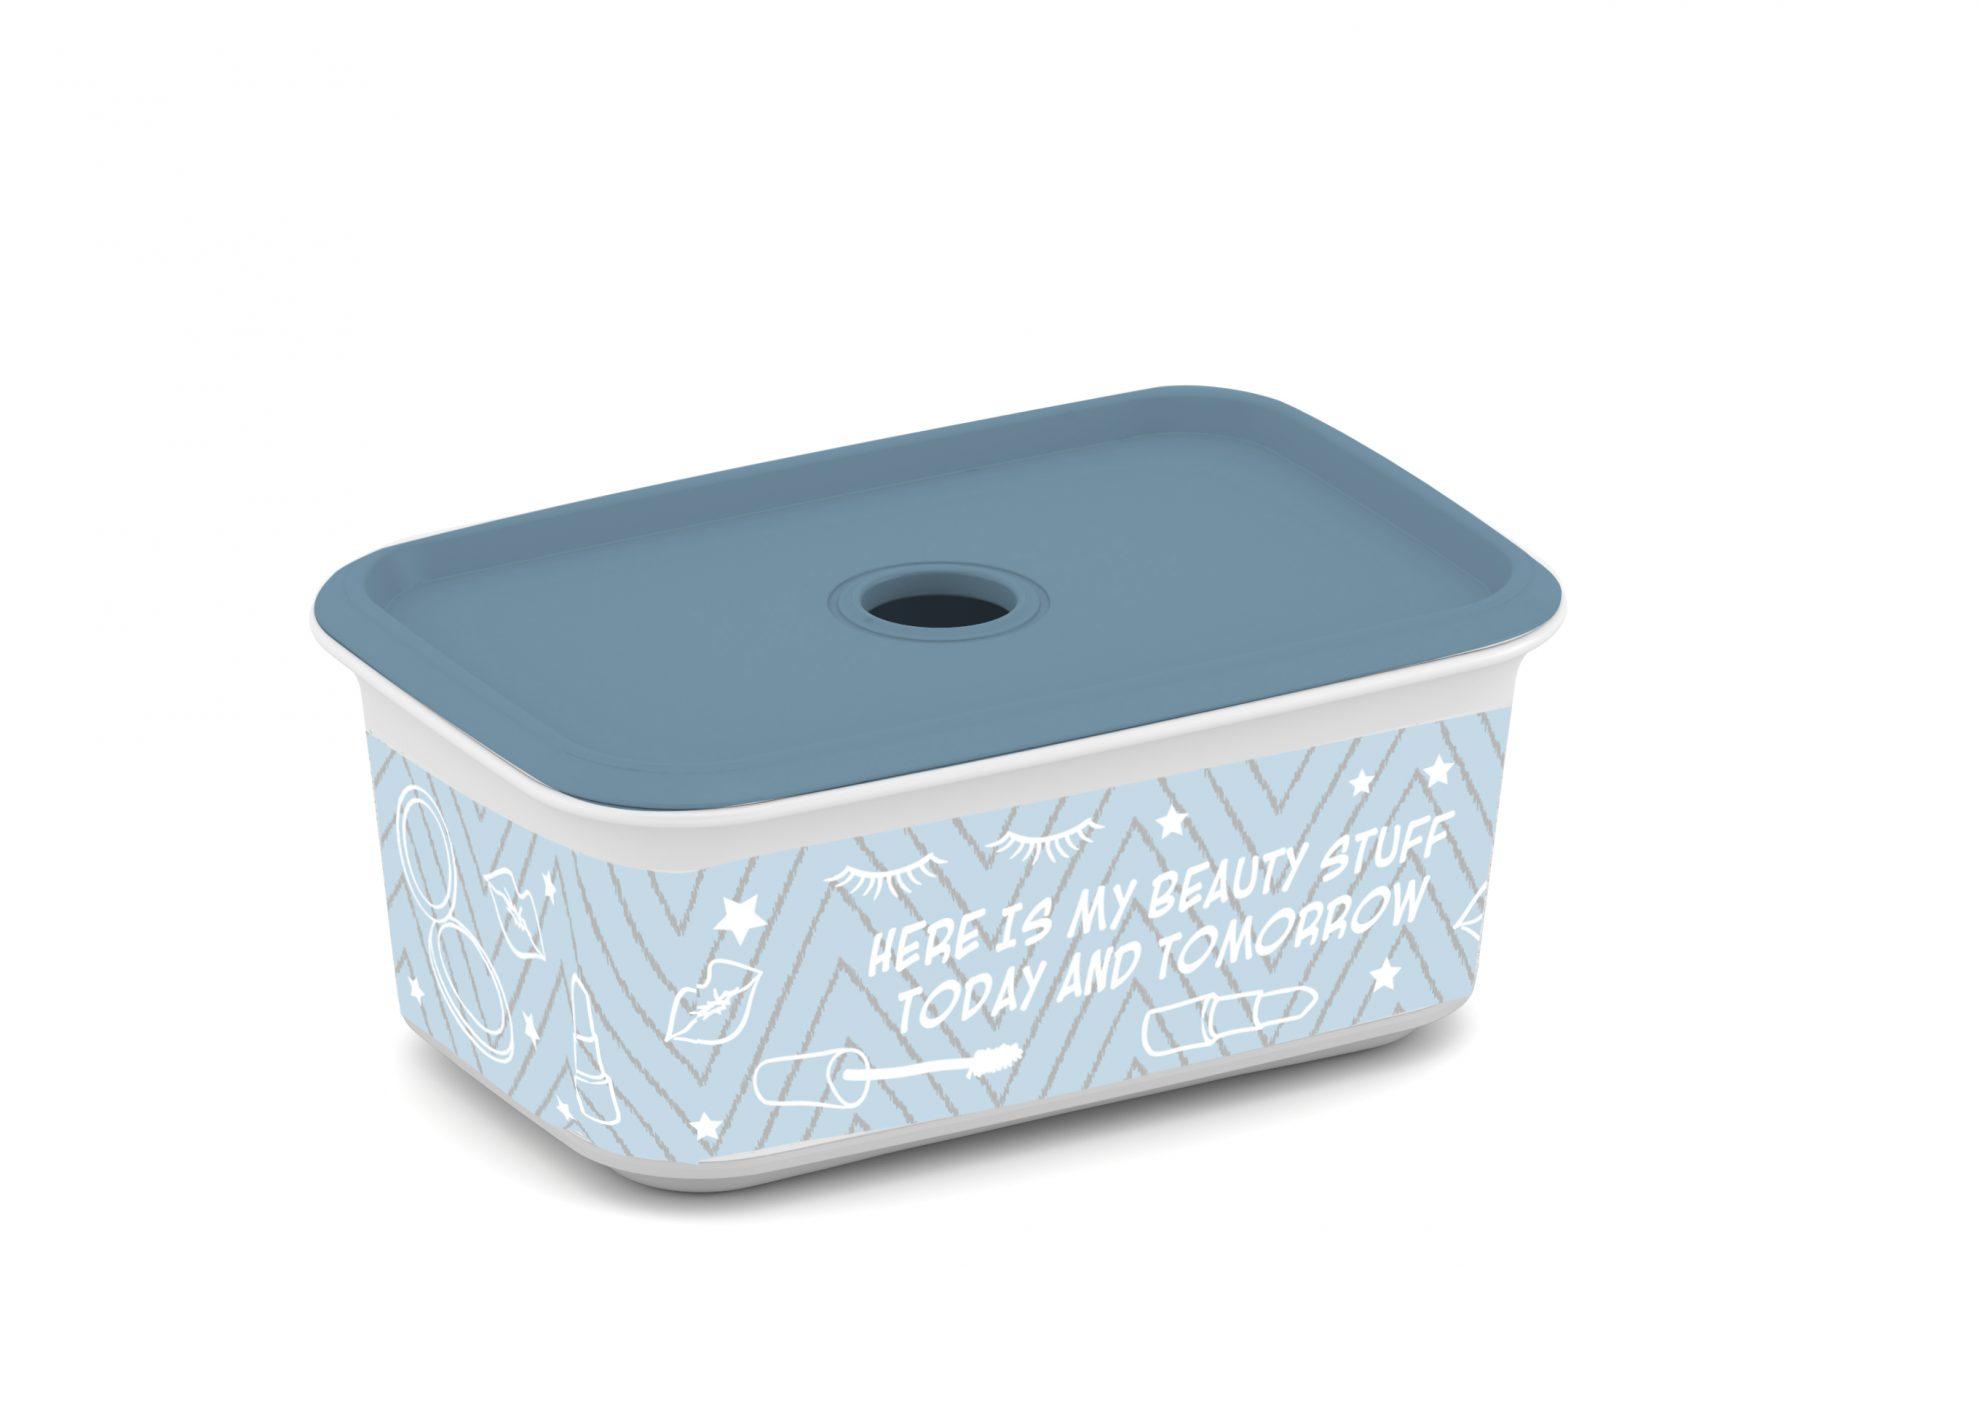 קופסת שיק 1.5 ליטר XS - וויטי